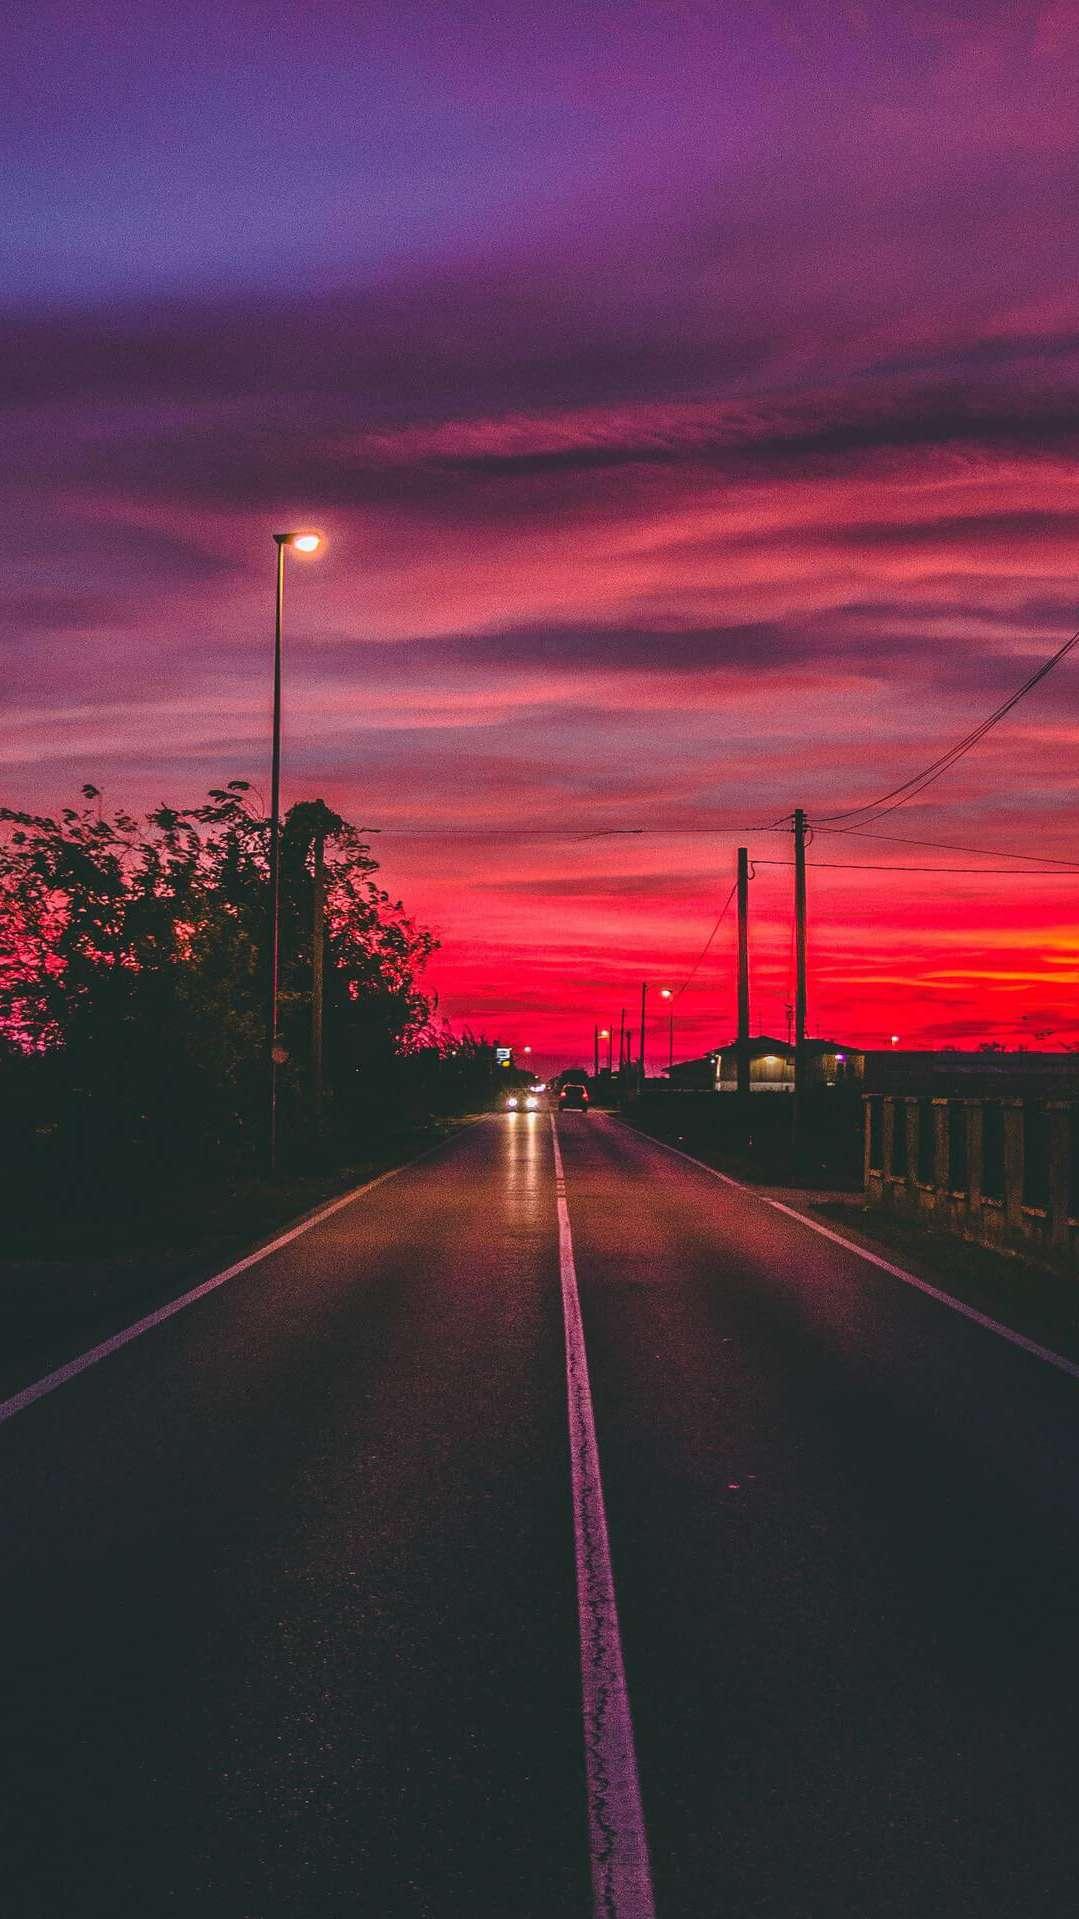 Sunset Roadway iPhone Wallpaper